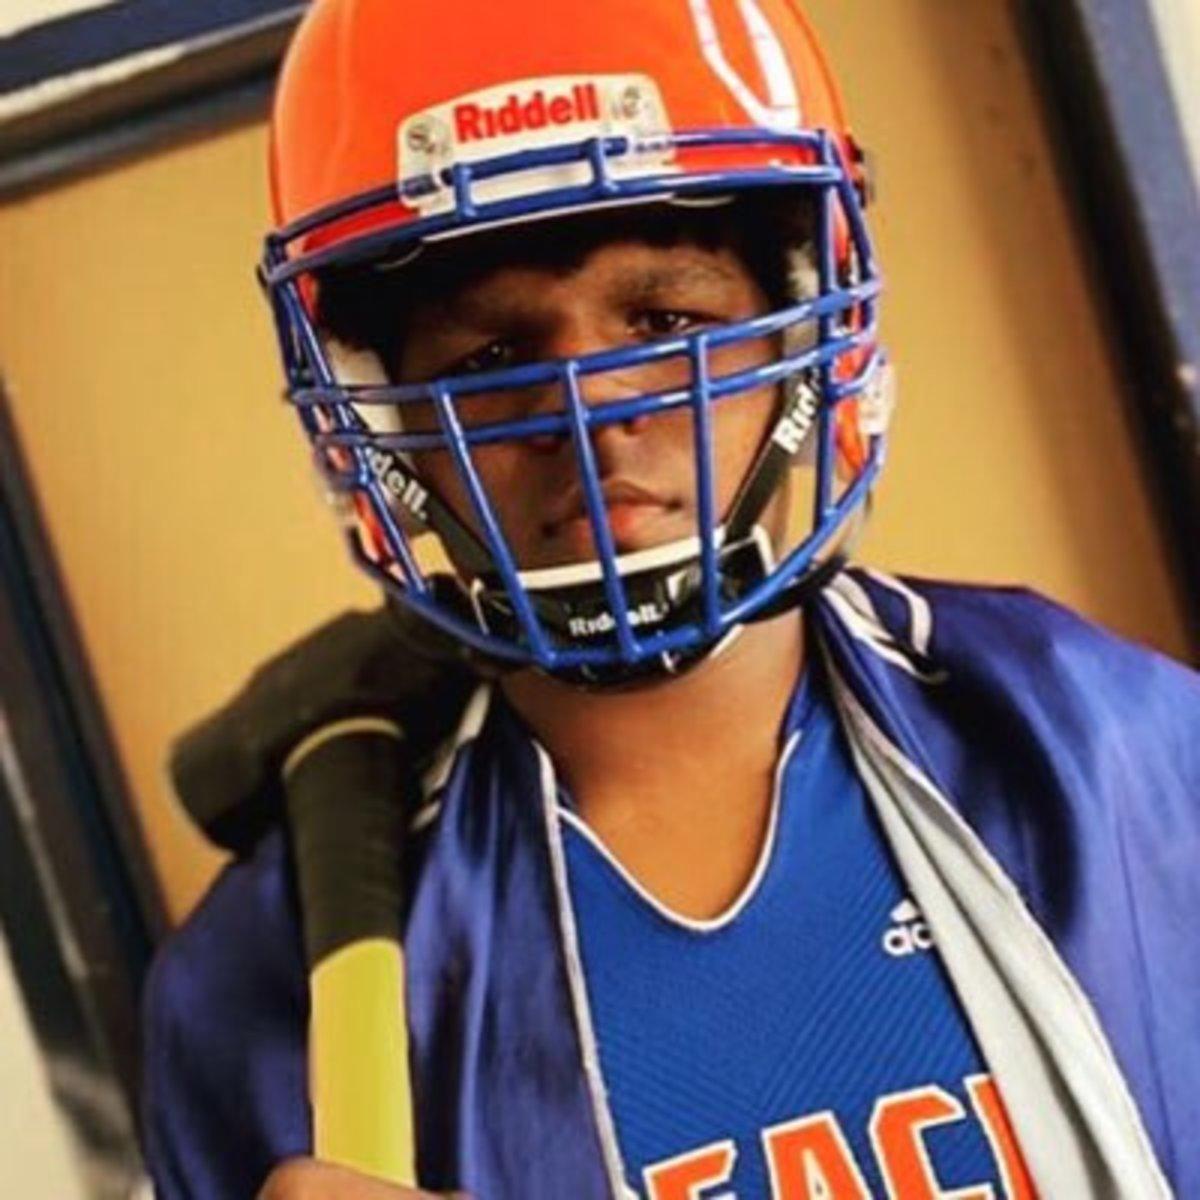 Josh Conerly Jr. wearing his high school gear.